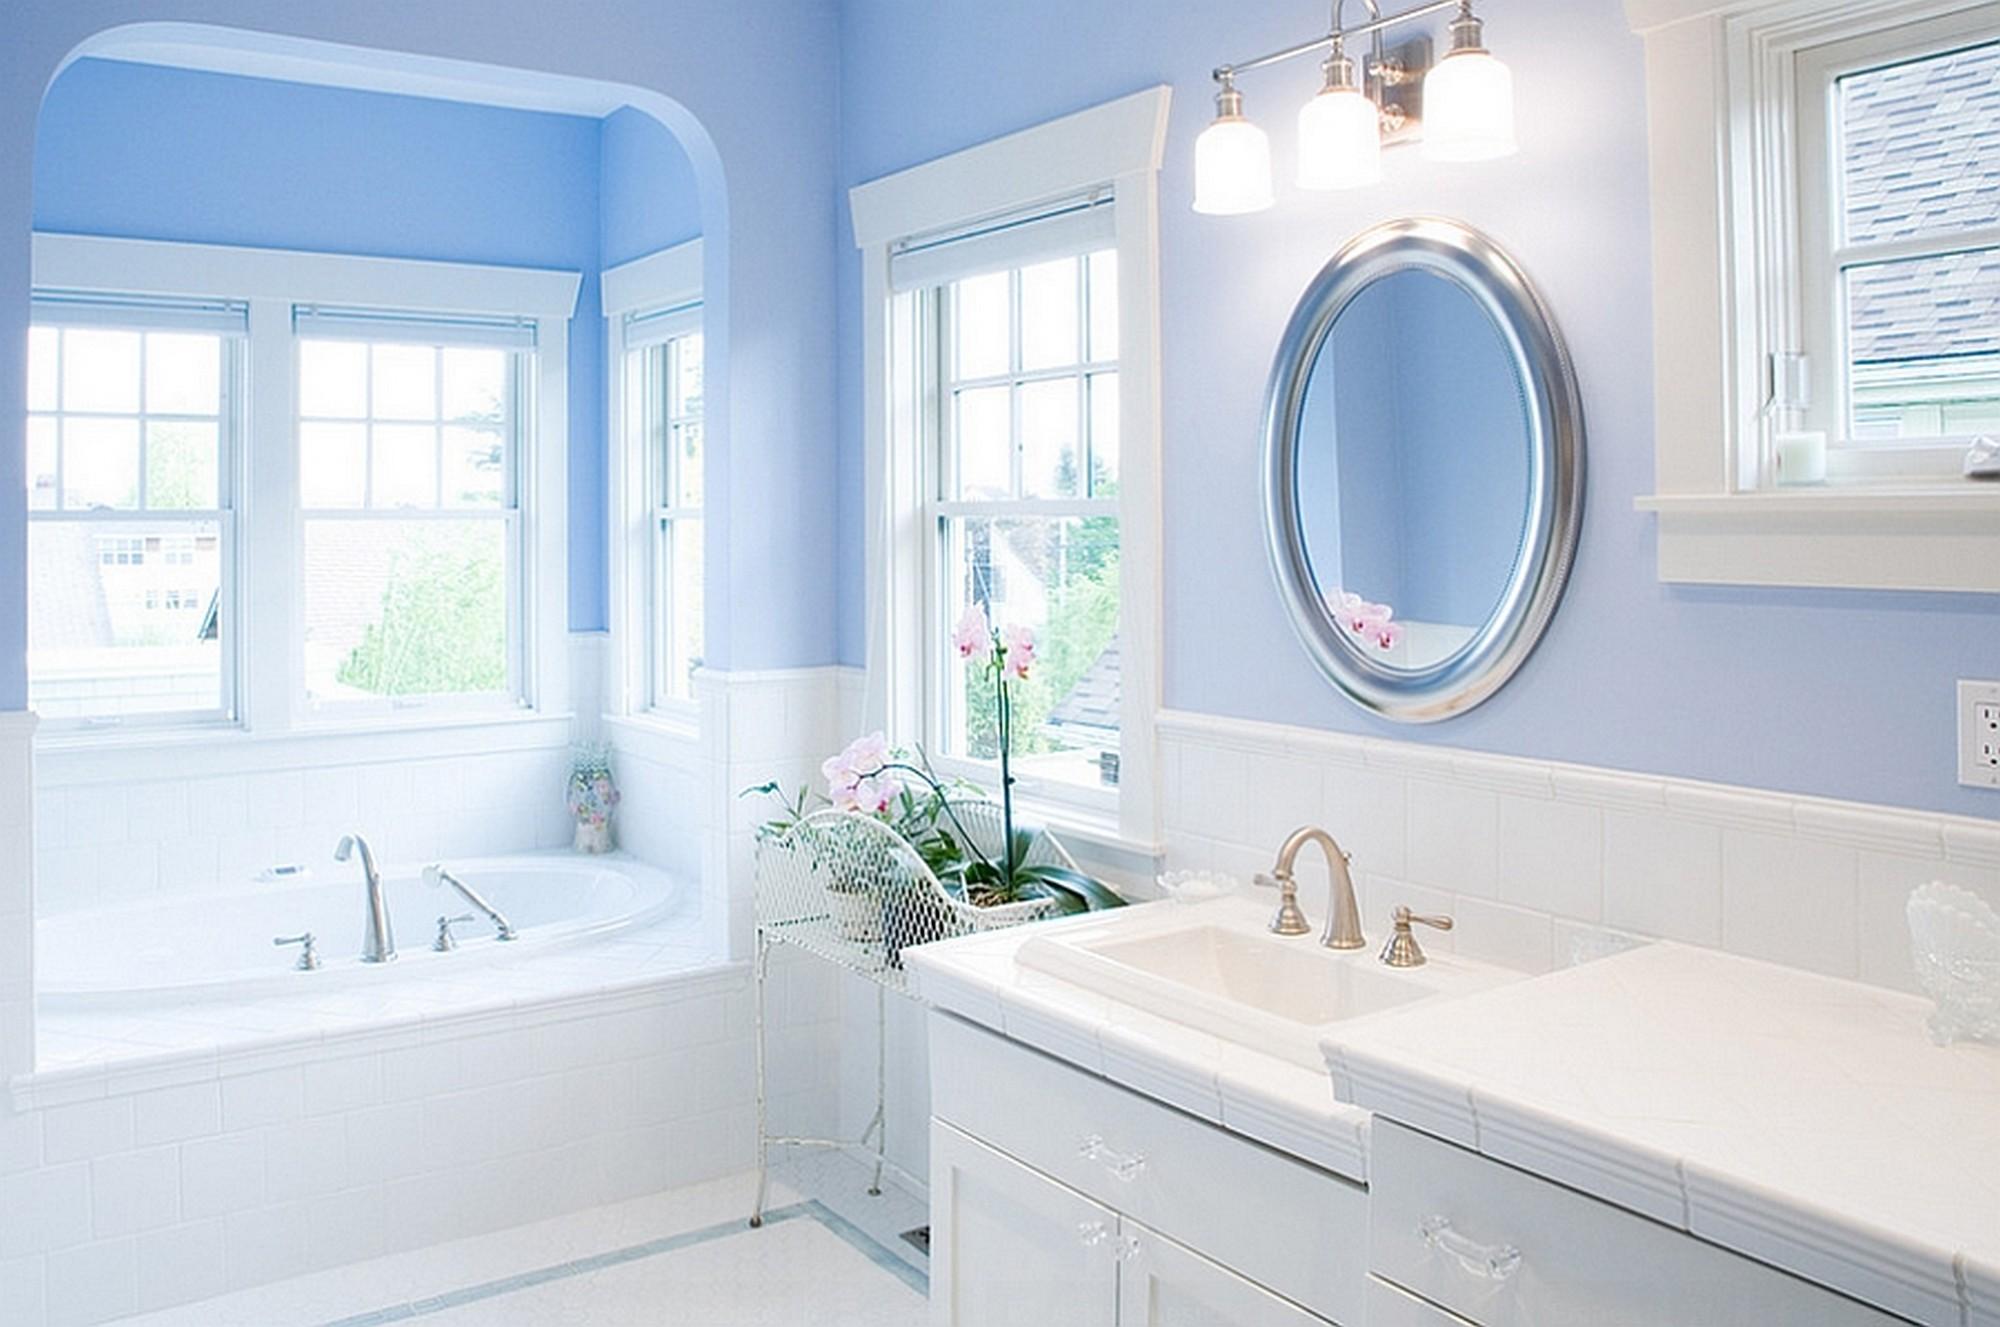 50 best bathroom design ideas for 2016 for Second bathroom ideas